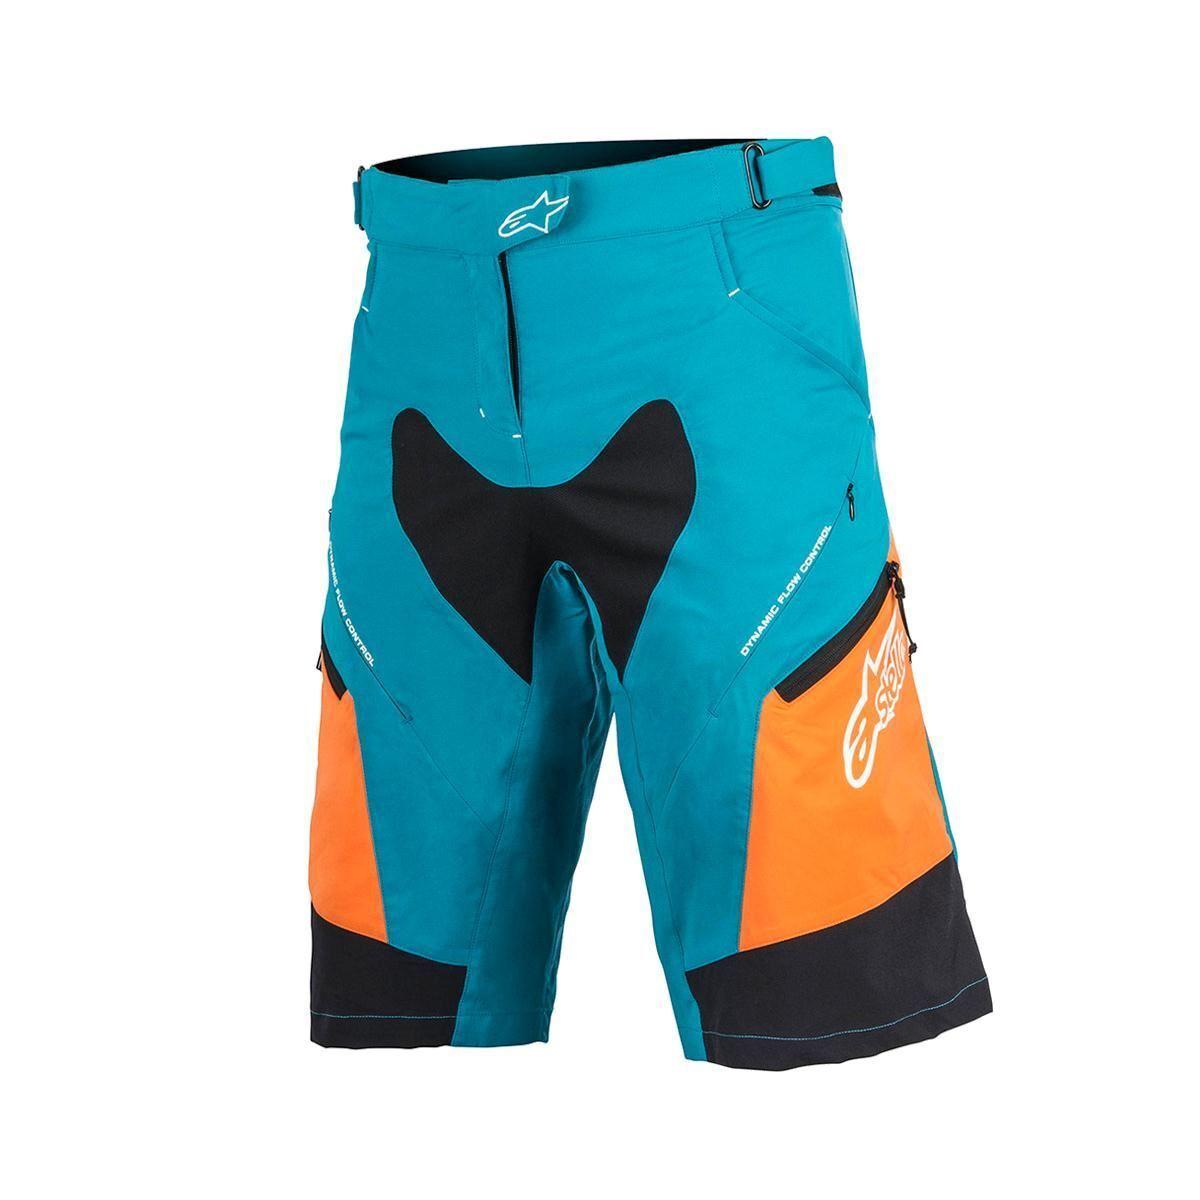 Pantalones cortos para Ciclismo Alpinestars Stella gota 2 2017 Ocean naranja brillante 34 bolsillos